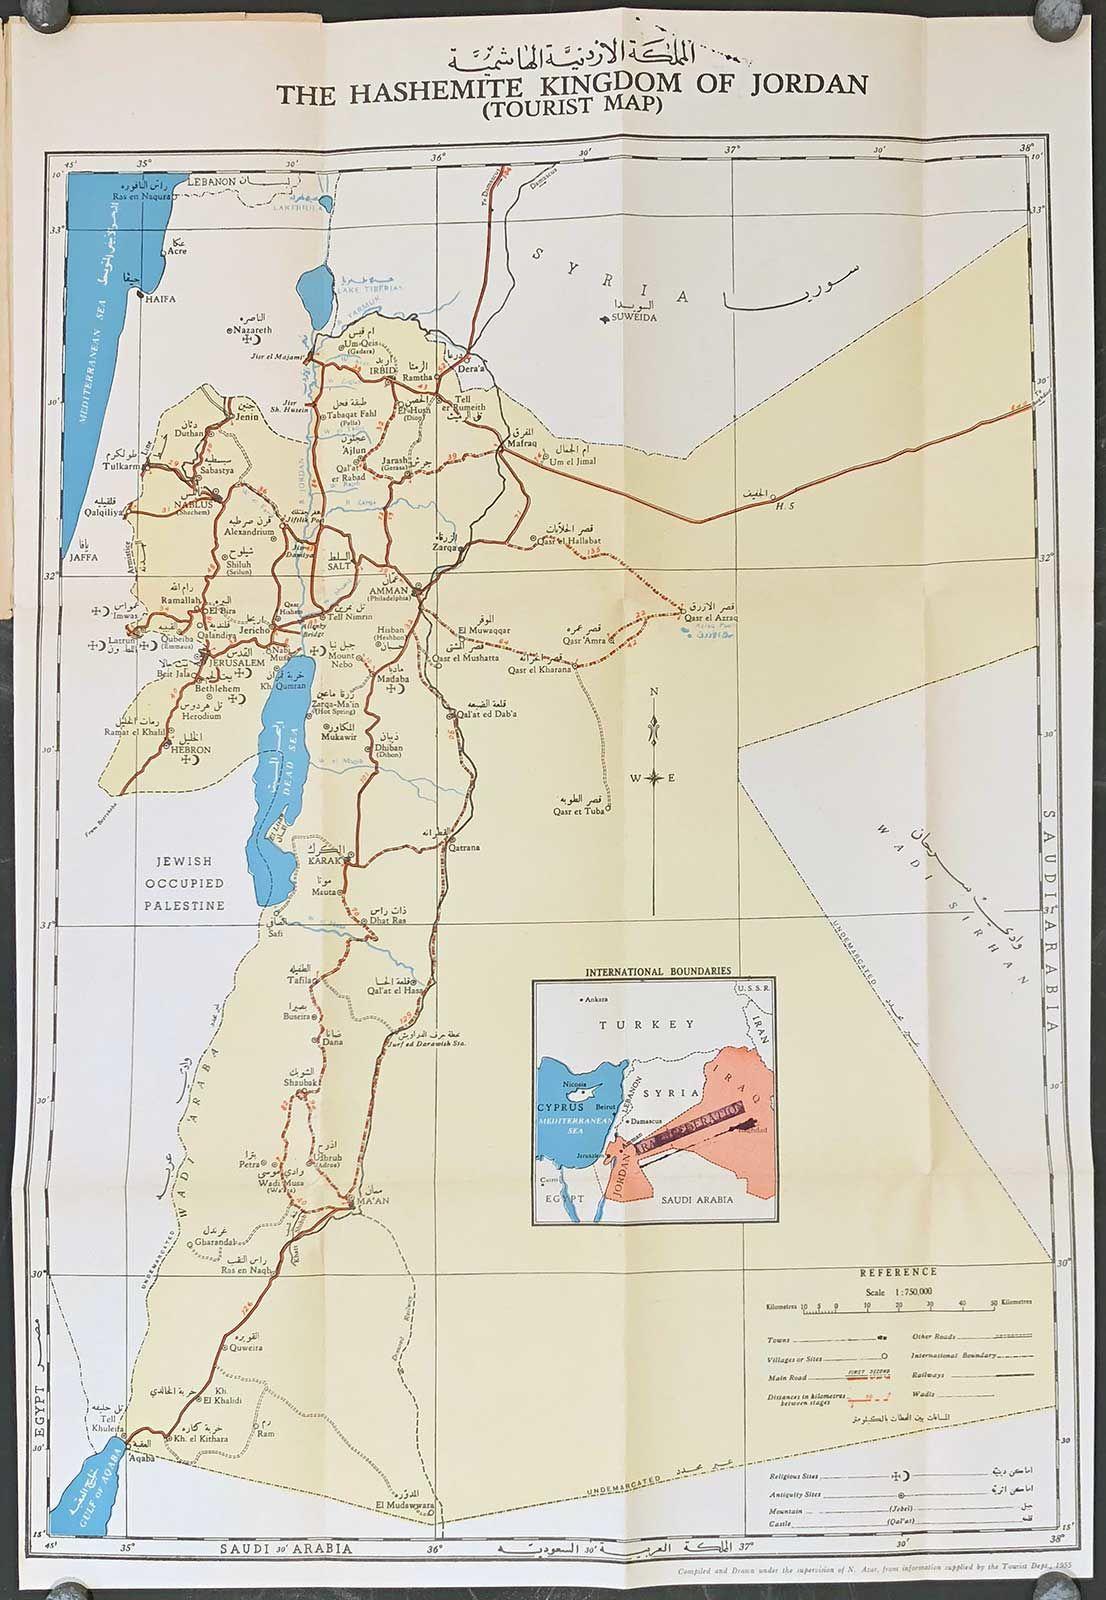 jordan asia, jordan and israel map, north korea map, middle east map, liberia map, jordan religion map, jordan middle east, jordan river utah map, jordan capital on map, jordan river valley map, jordan location on world map, jordan river on map, on jordan on the map